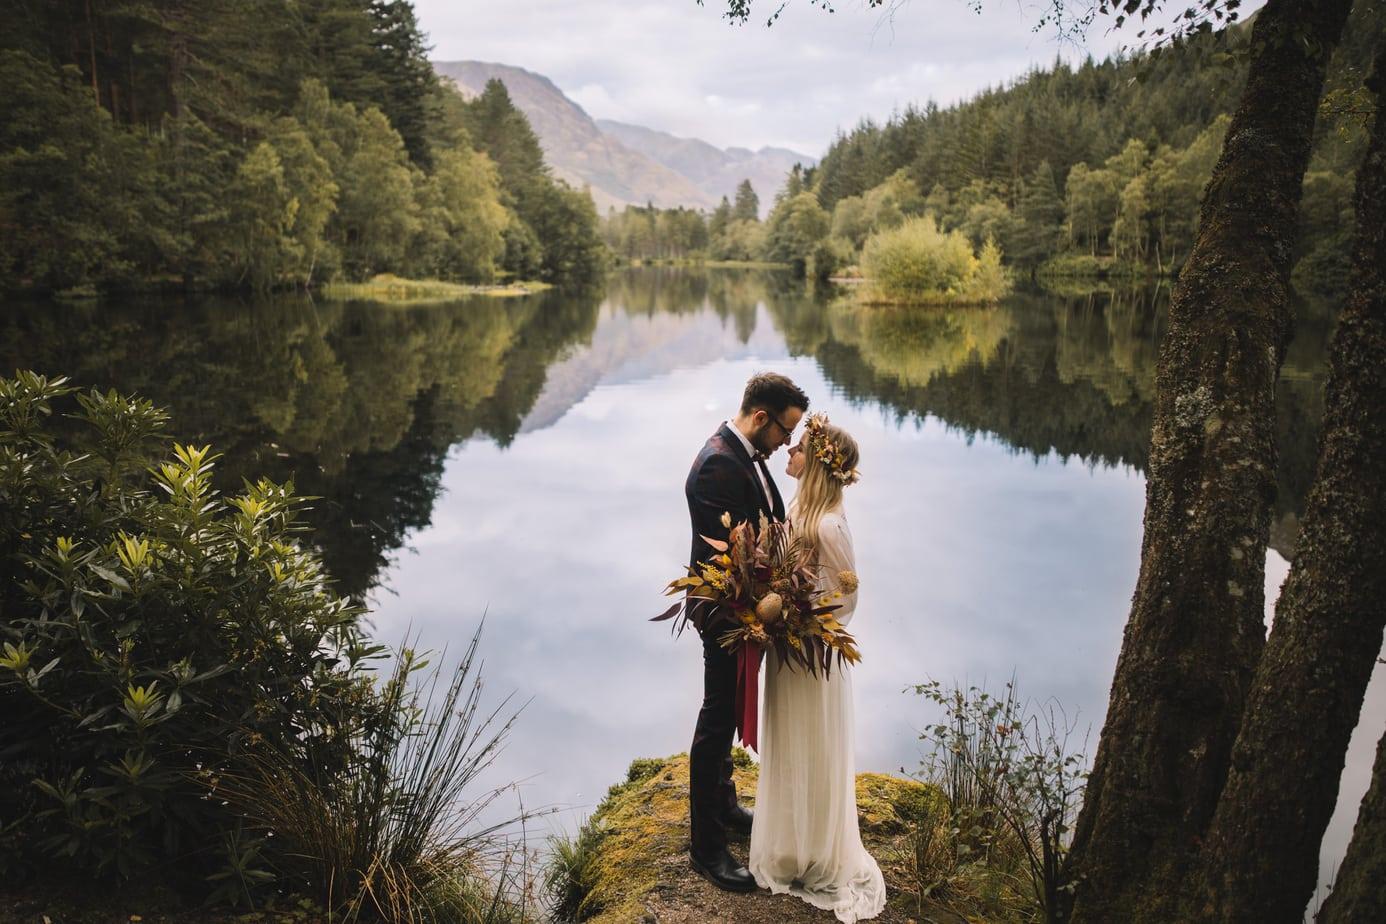 Scotland Elopement. Couple eloping at Glencoe Lochan, bride wearing a dried flower crown